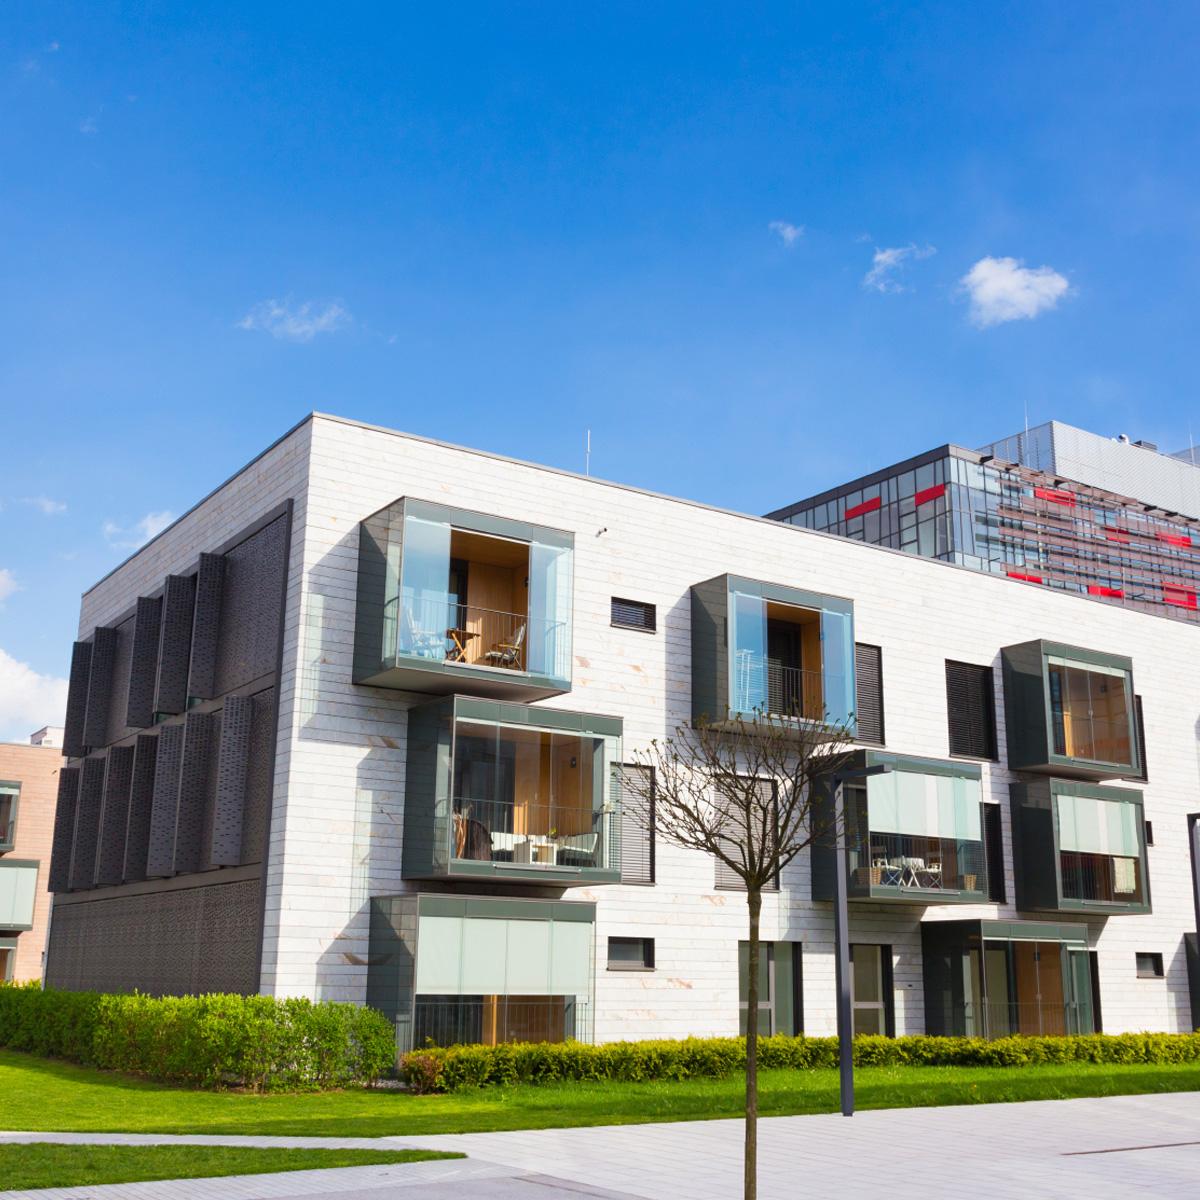 11 student accommodation blocks throughout the UK